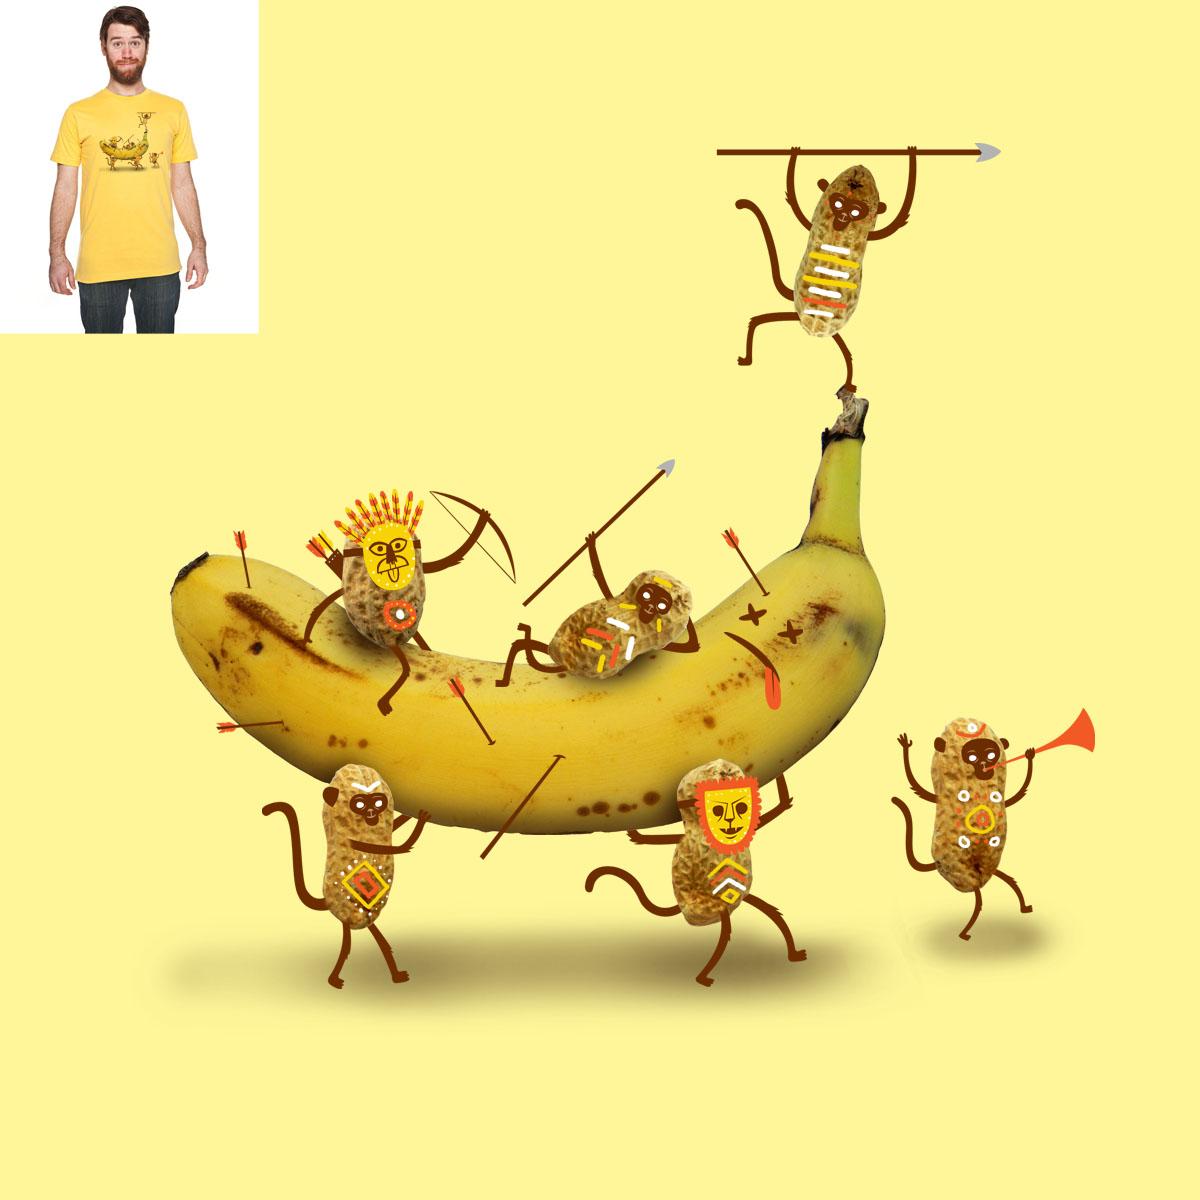 Monkeys areNuts by Wharton on Threadless